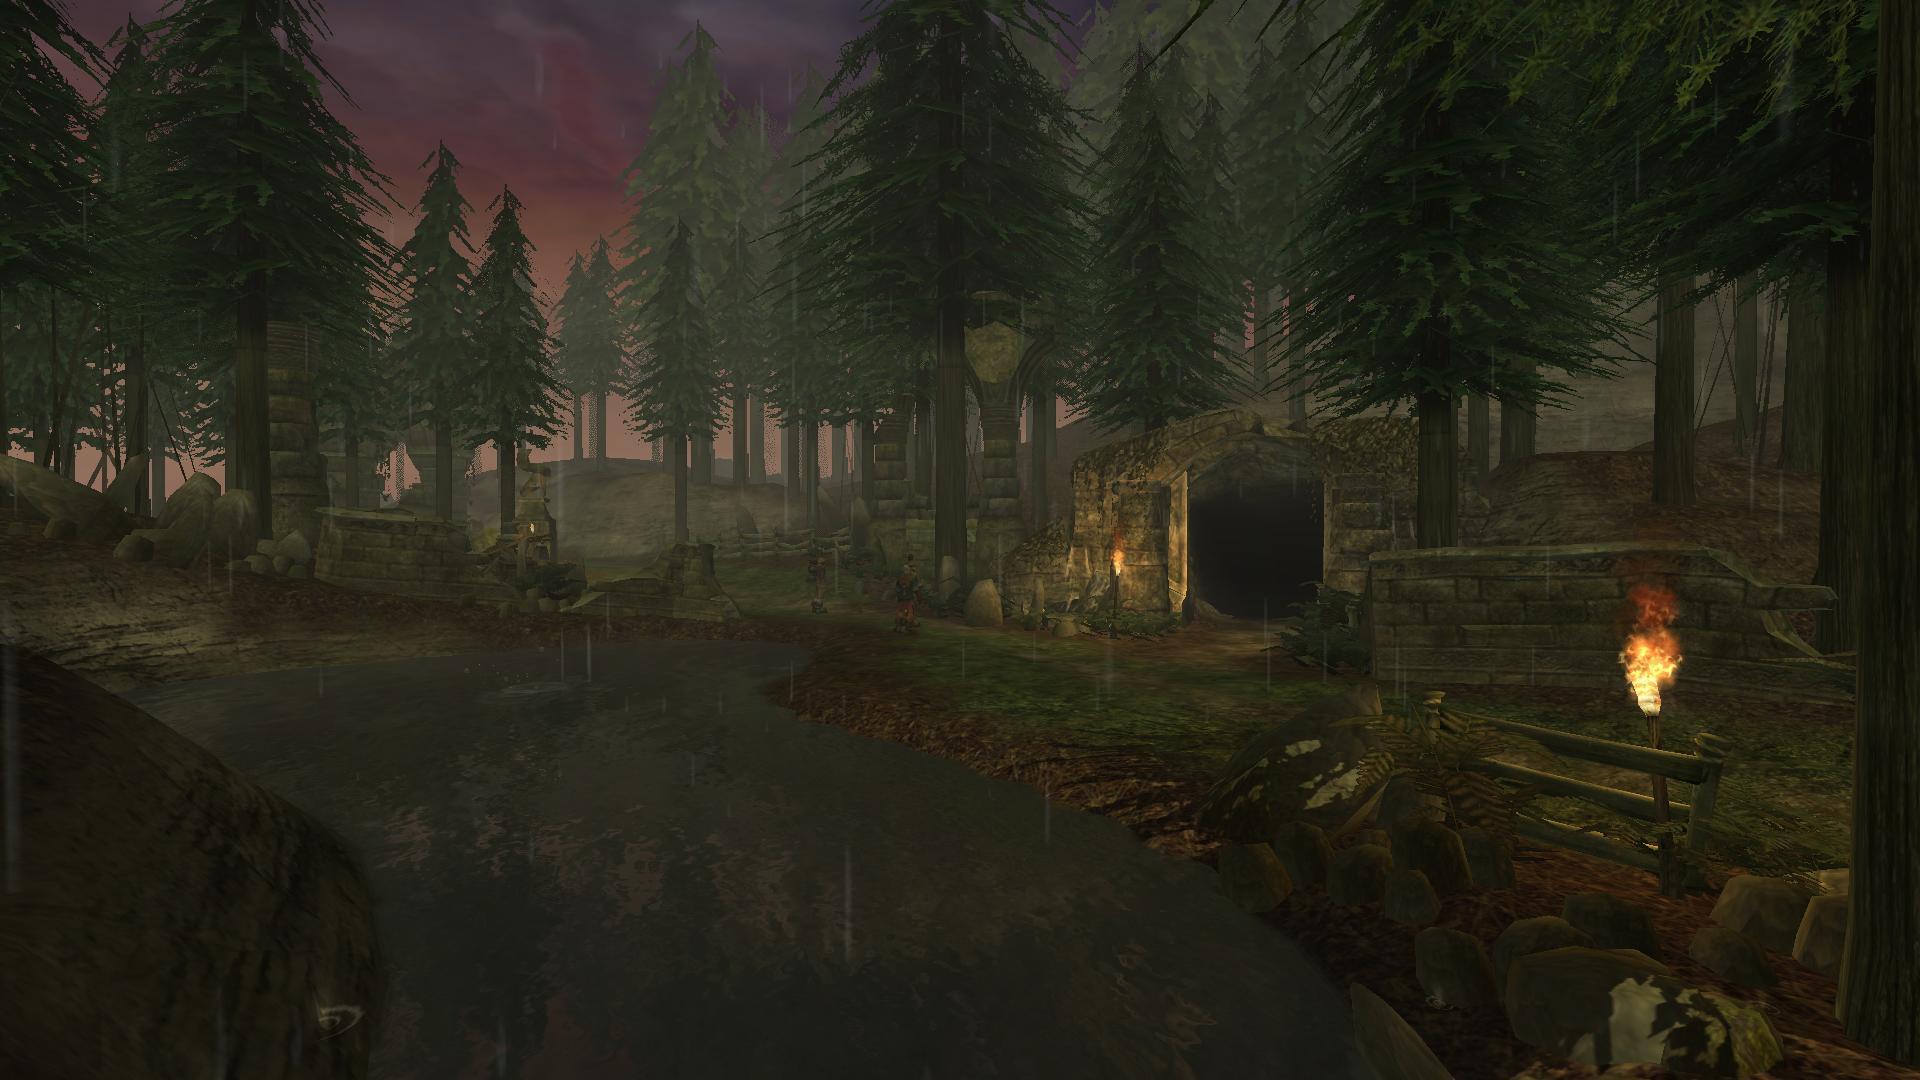 Demon doors | Secrets - Fable II Game Guide - gamepressure.com